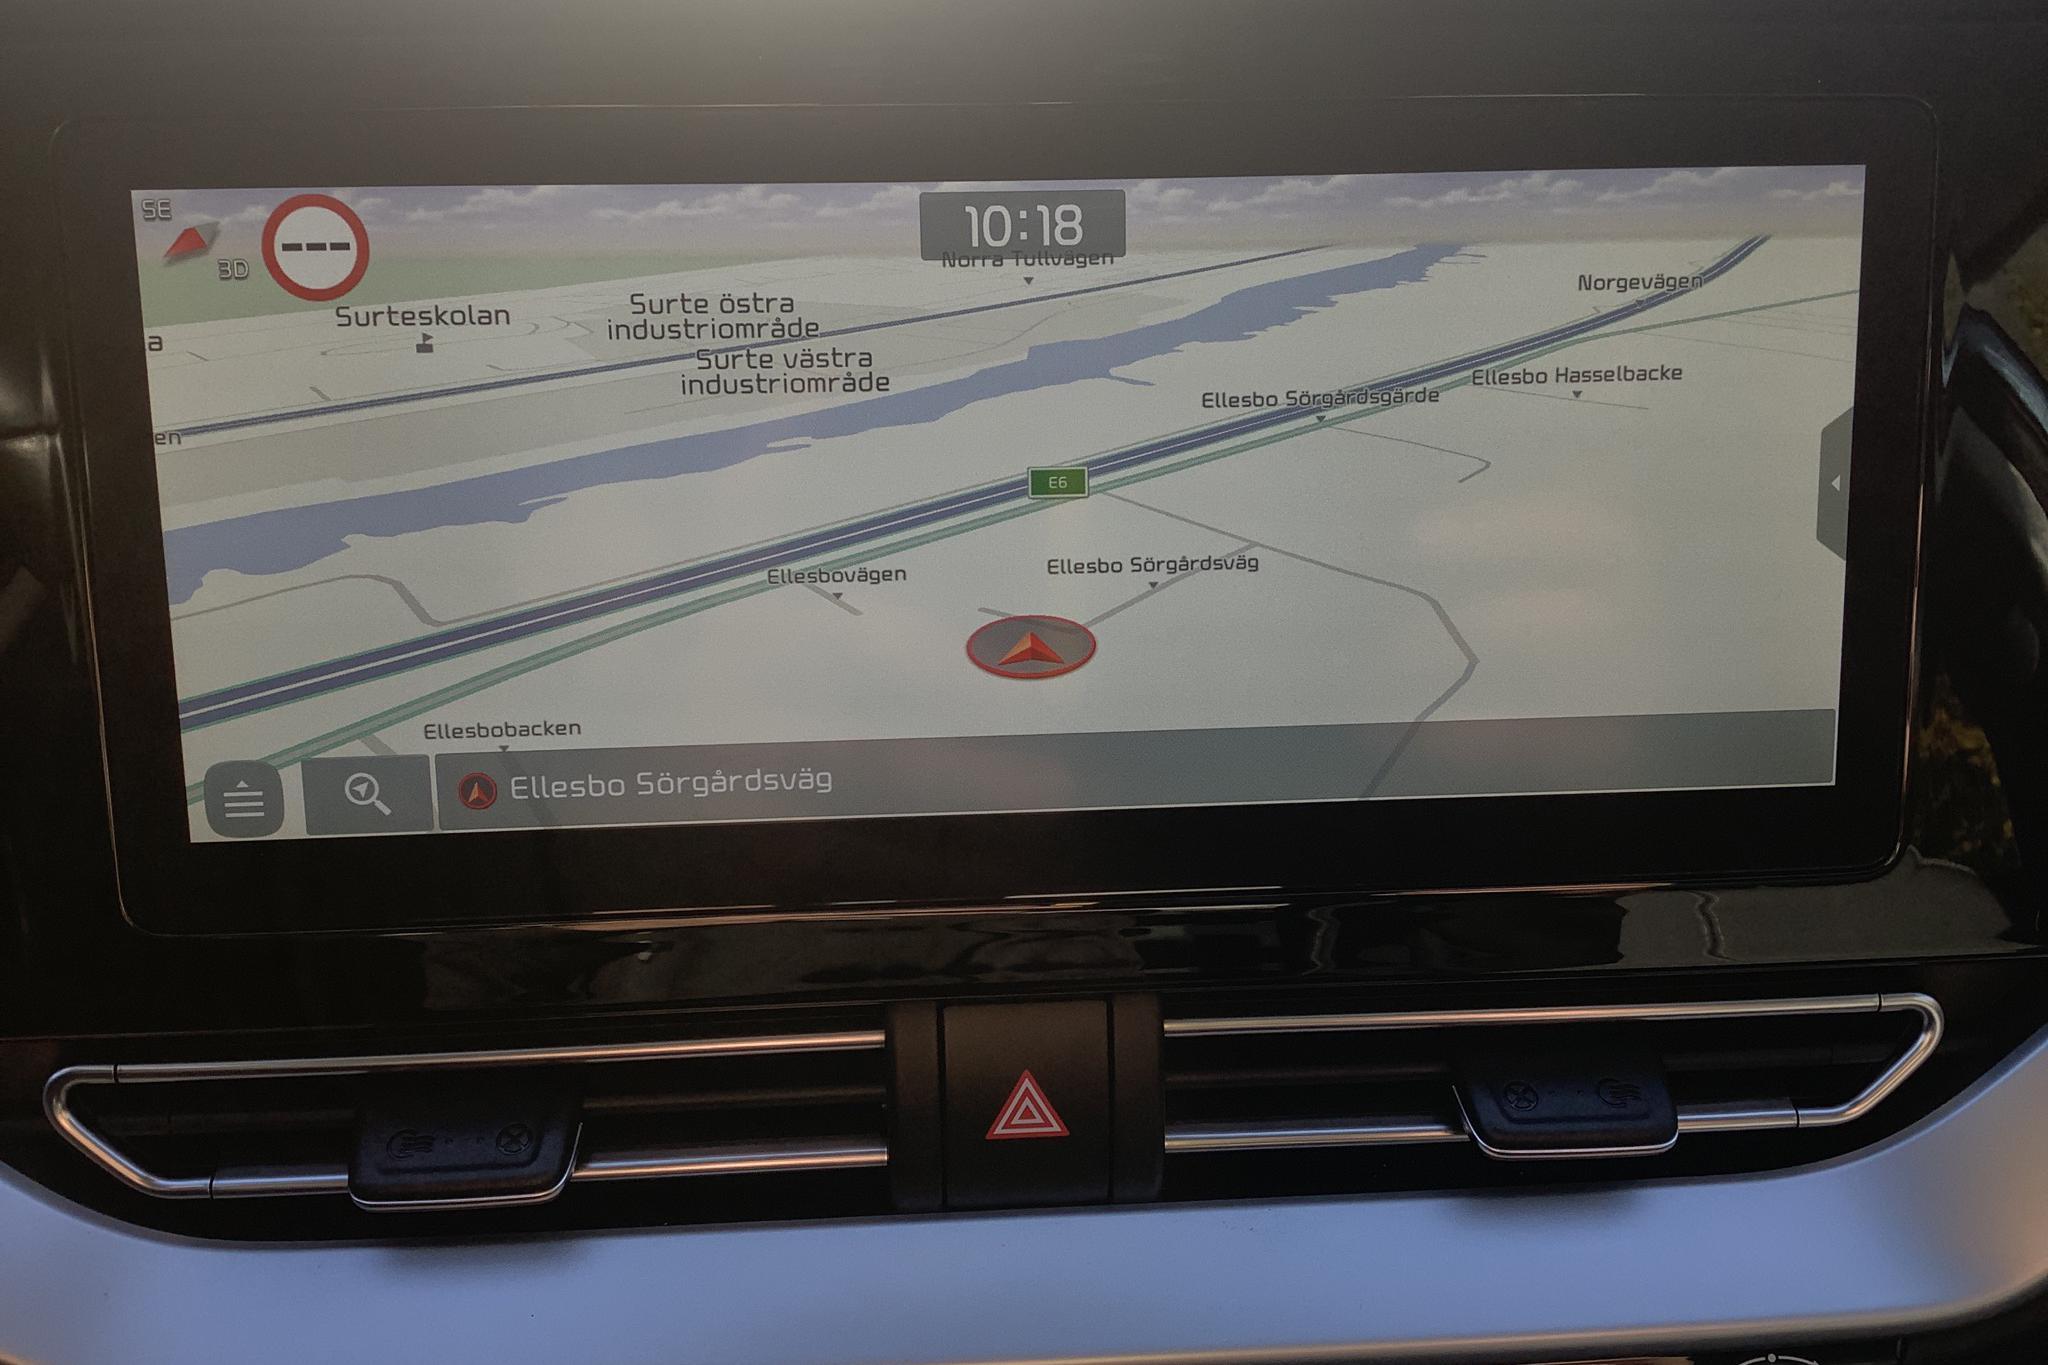 KIA Niro Plug-in Hybrid 1.6 LCI (141hk) - 27 250 km - Automatic - blue - 2020